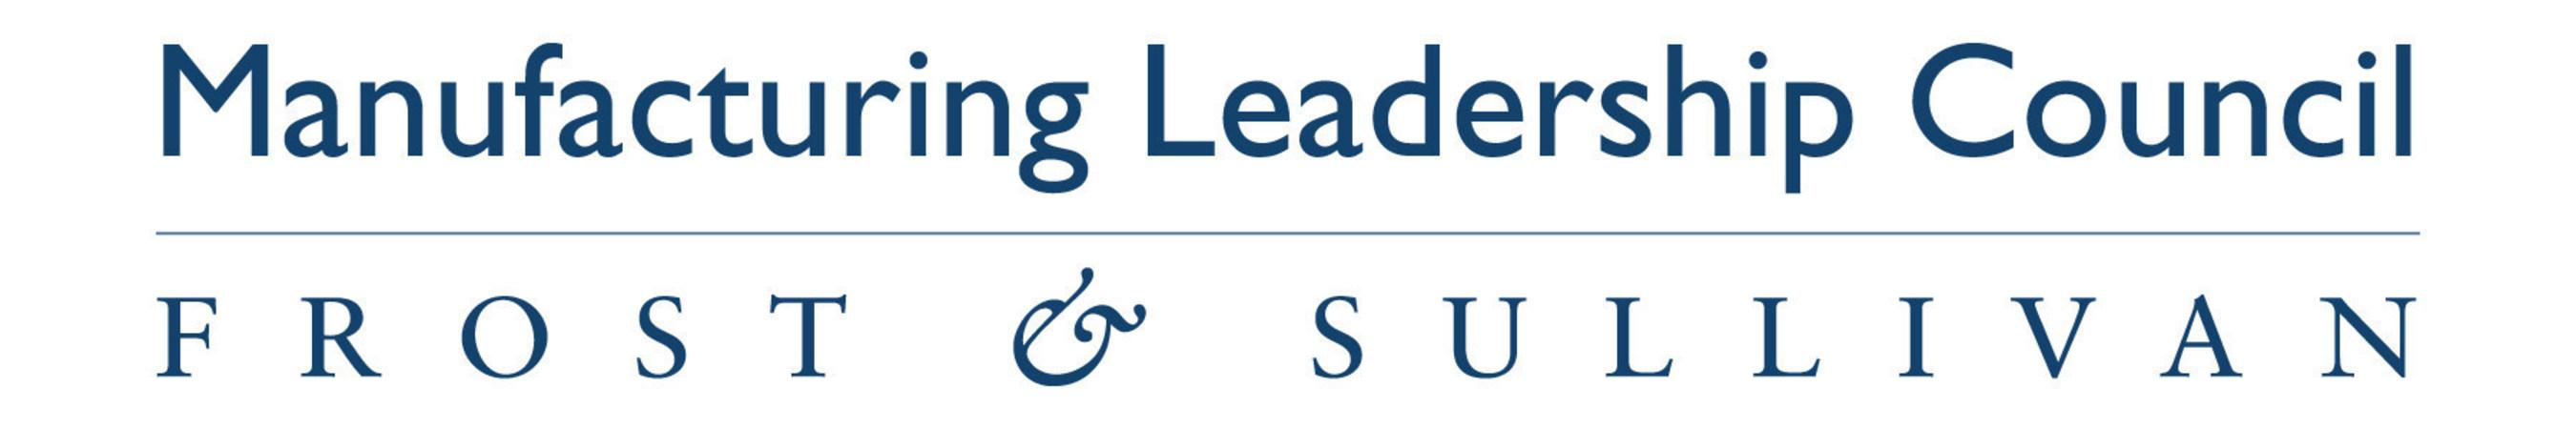 2015 Manufacturing Leadership Award Winners Announced